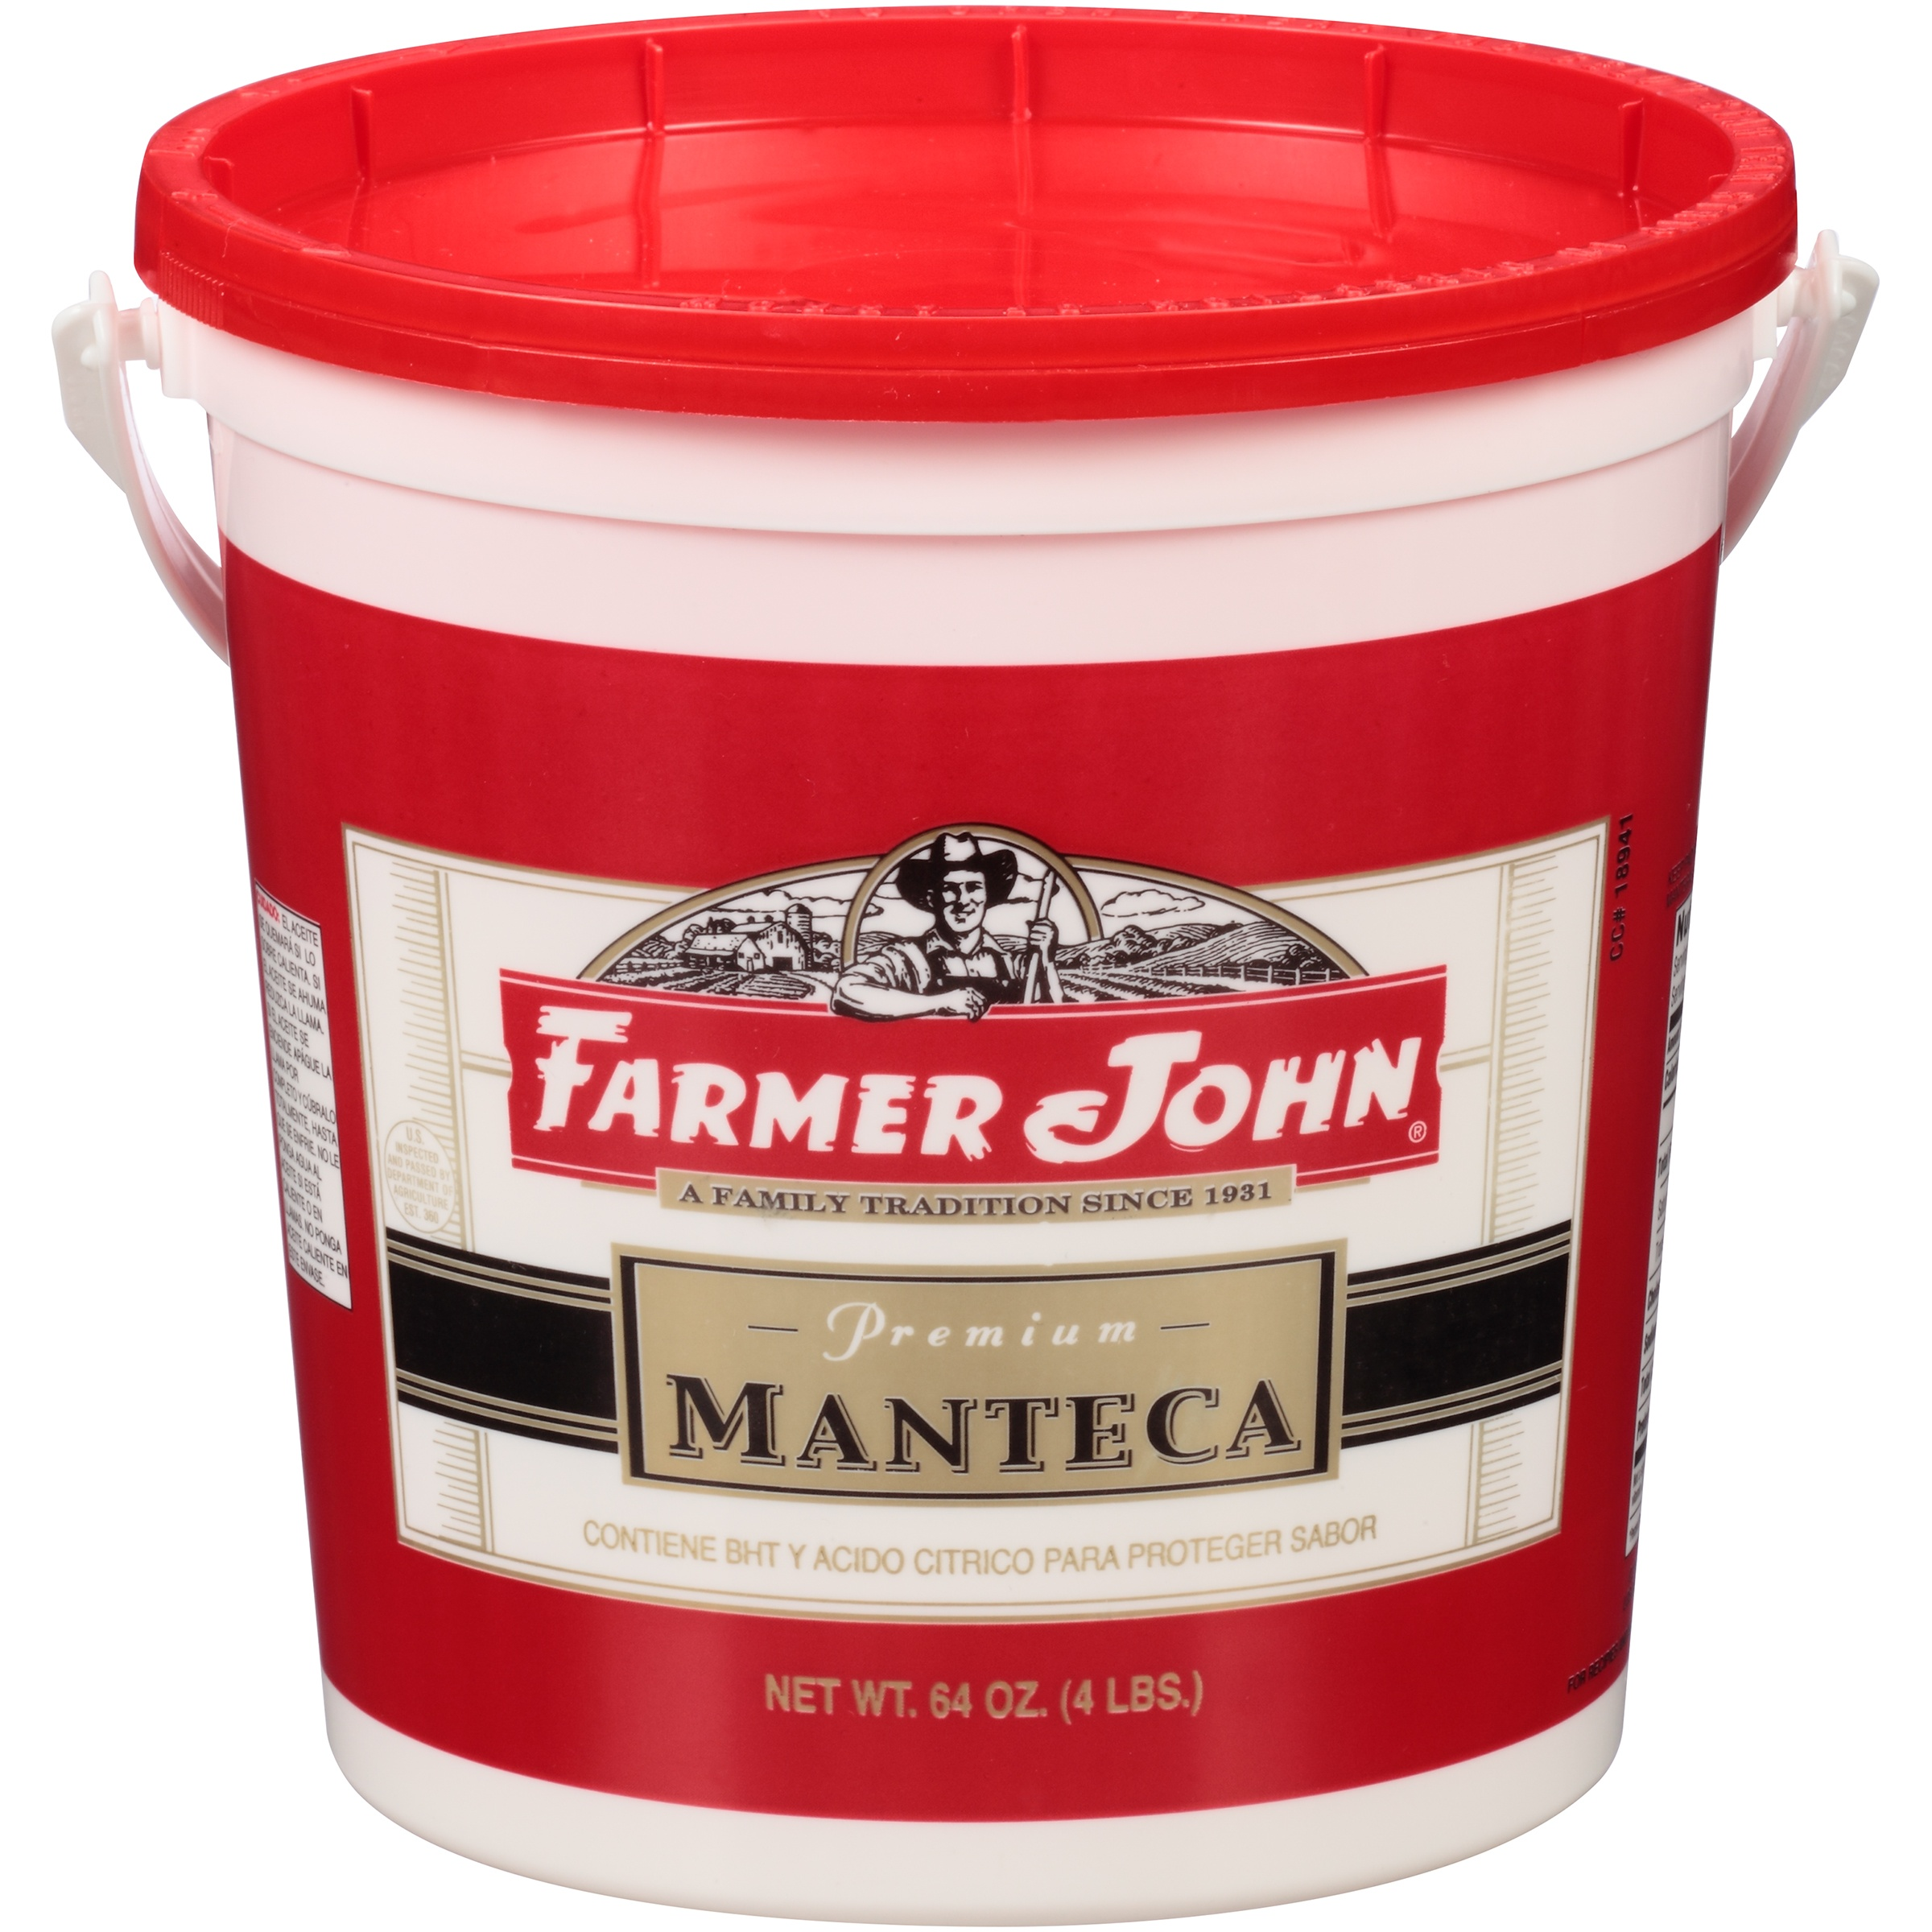 Farmer John and the Metal Bucket